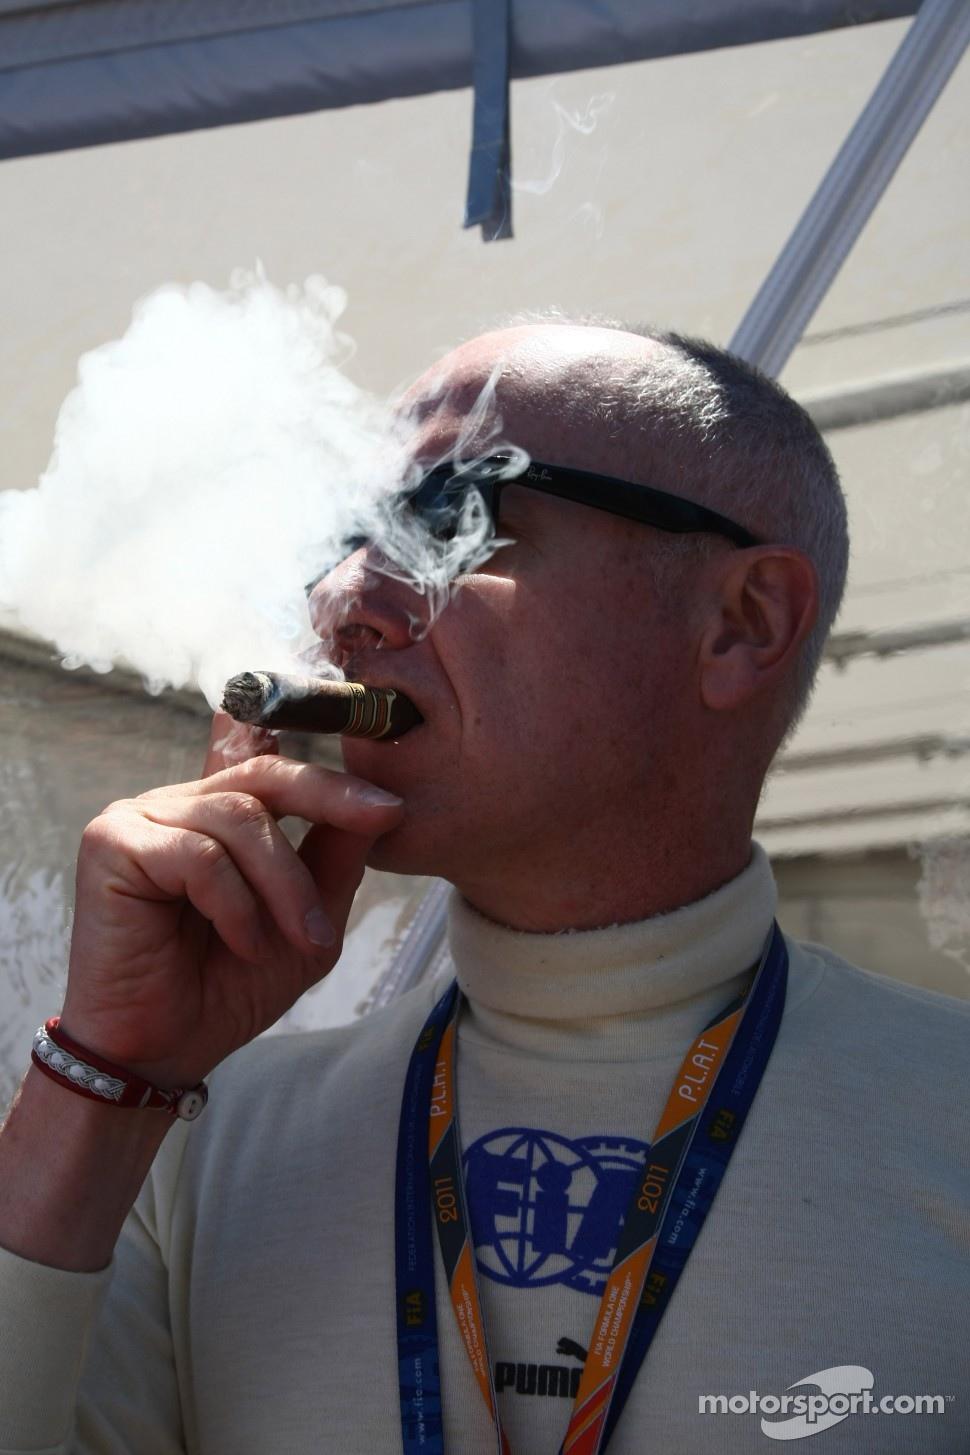 доктор Формулы-1 Гэри Хартстейн курит сигару на Гран-при Монако 2011